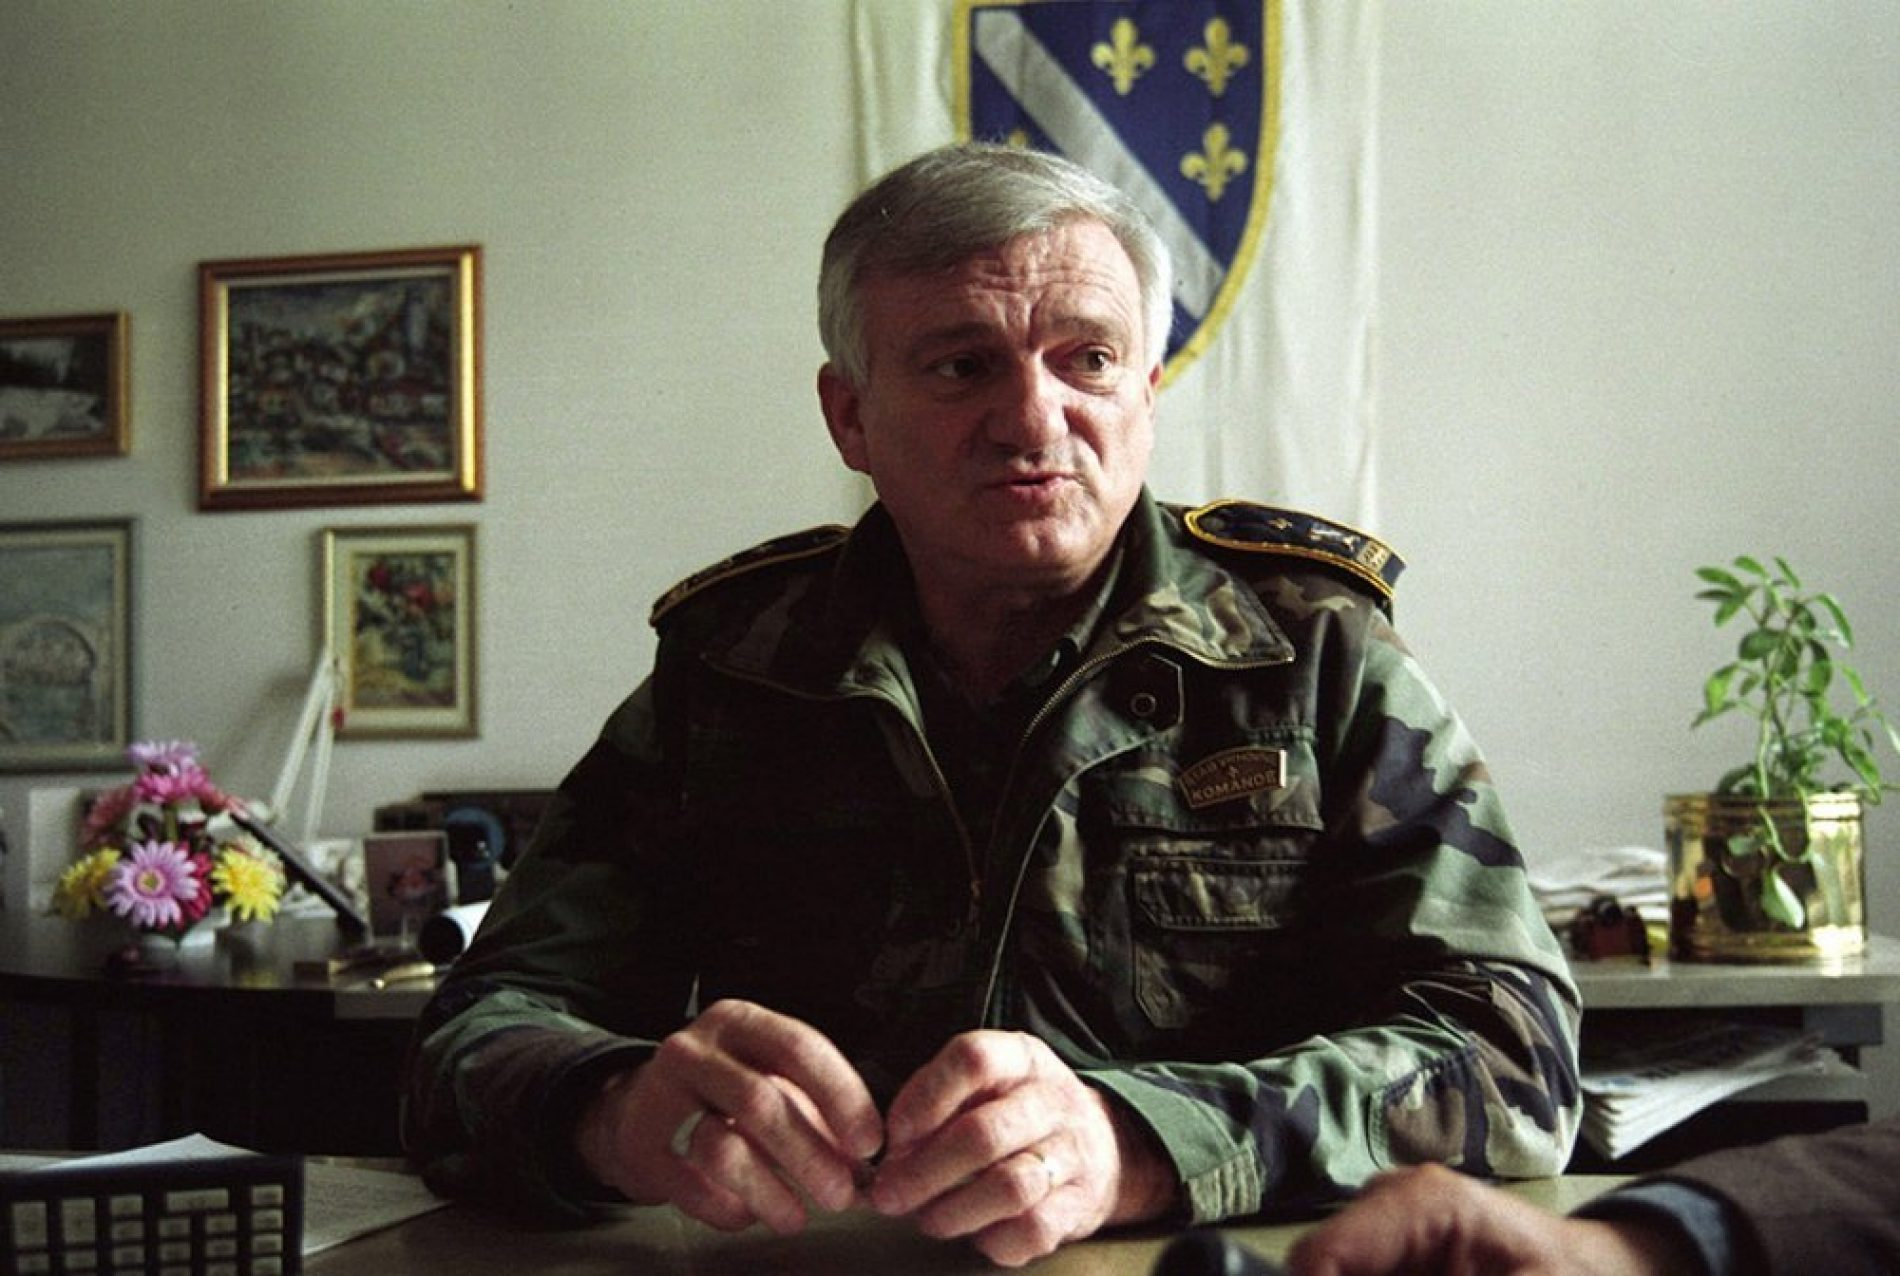 Preminuo Jovan Divjak, bivši general ARBiH